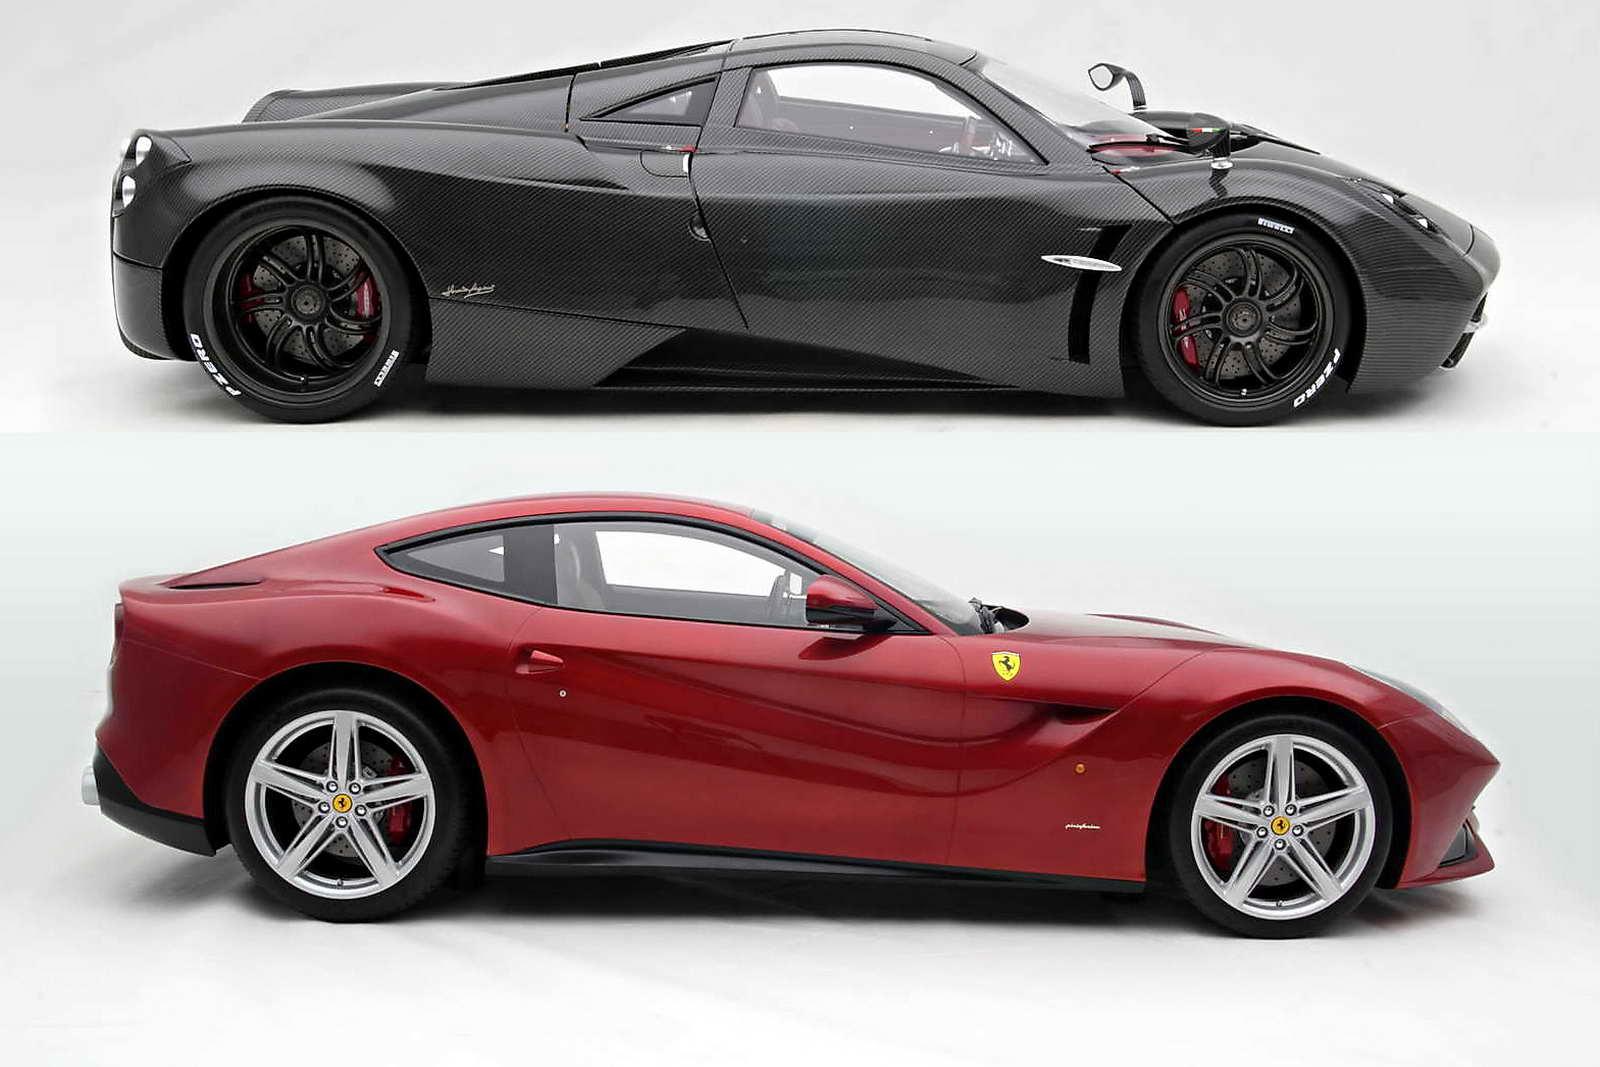 Pagani_Huayra_VS_Ferrari_F12_berlinetta_00